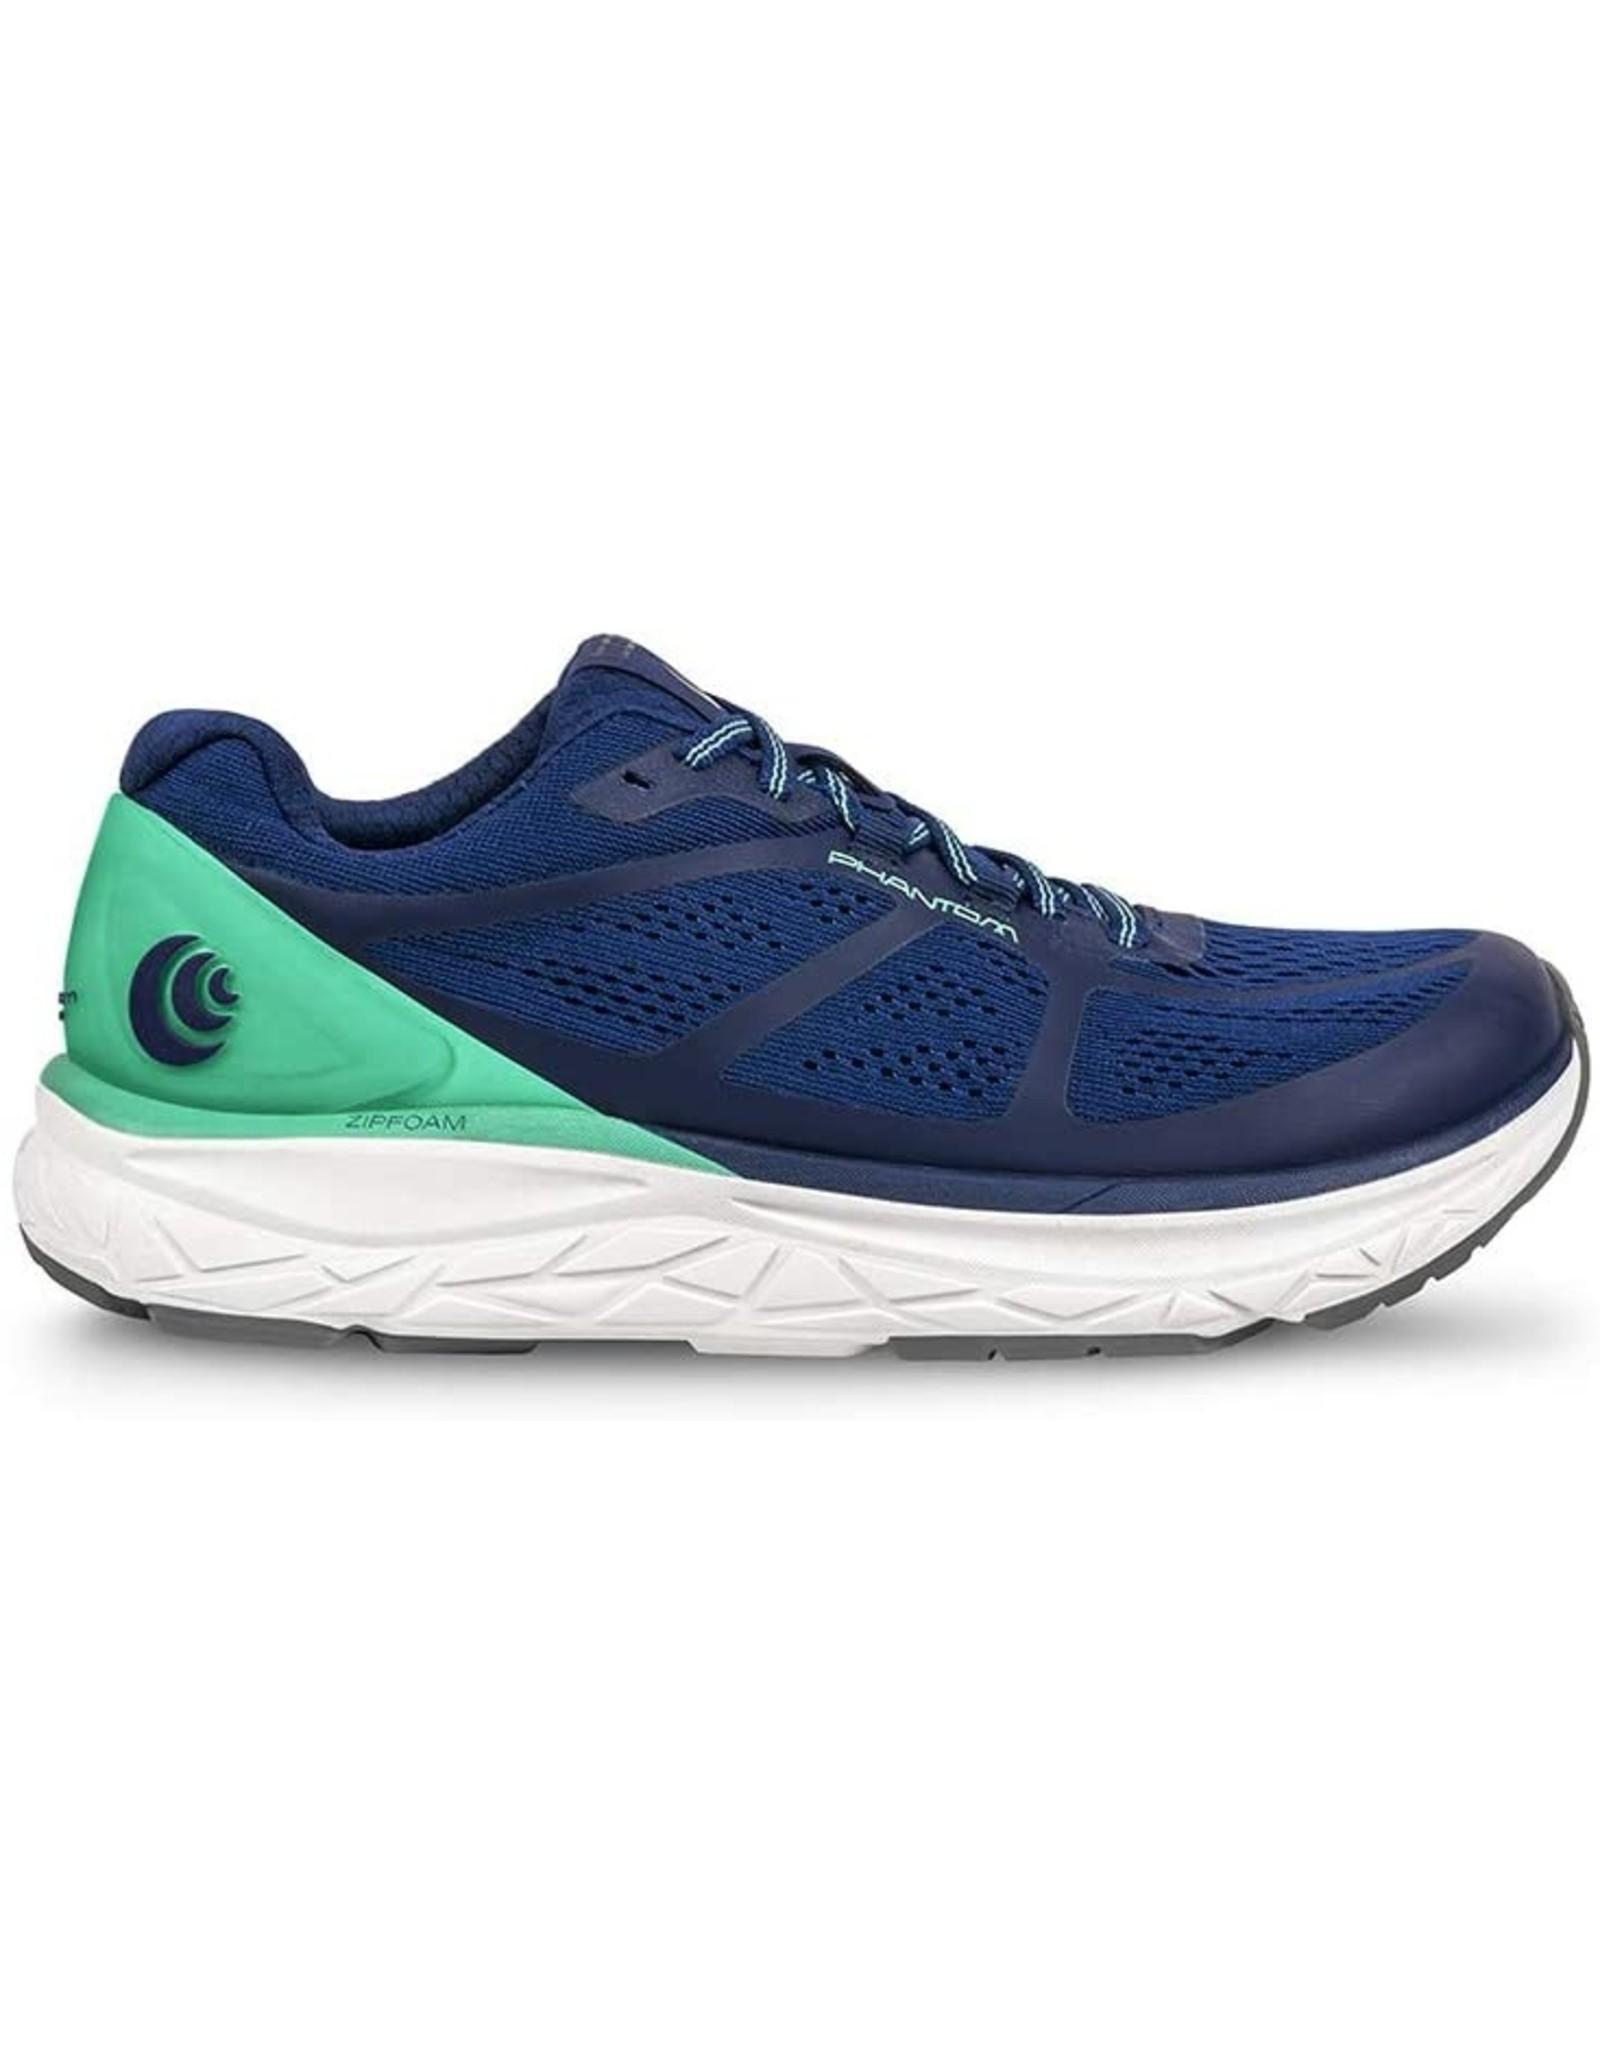 Topo Athletic Phantom Women's Road Running Shoe Cobalt / Seafoam Size 10